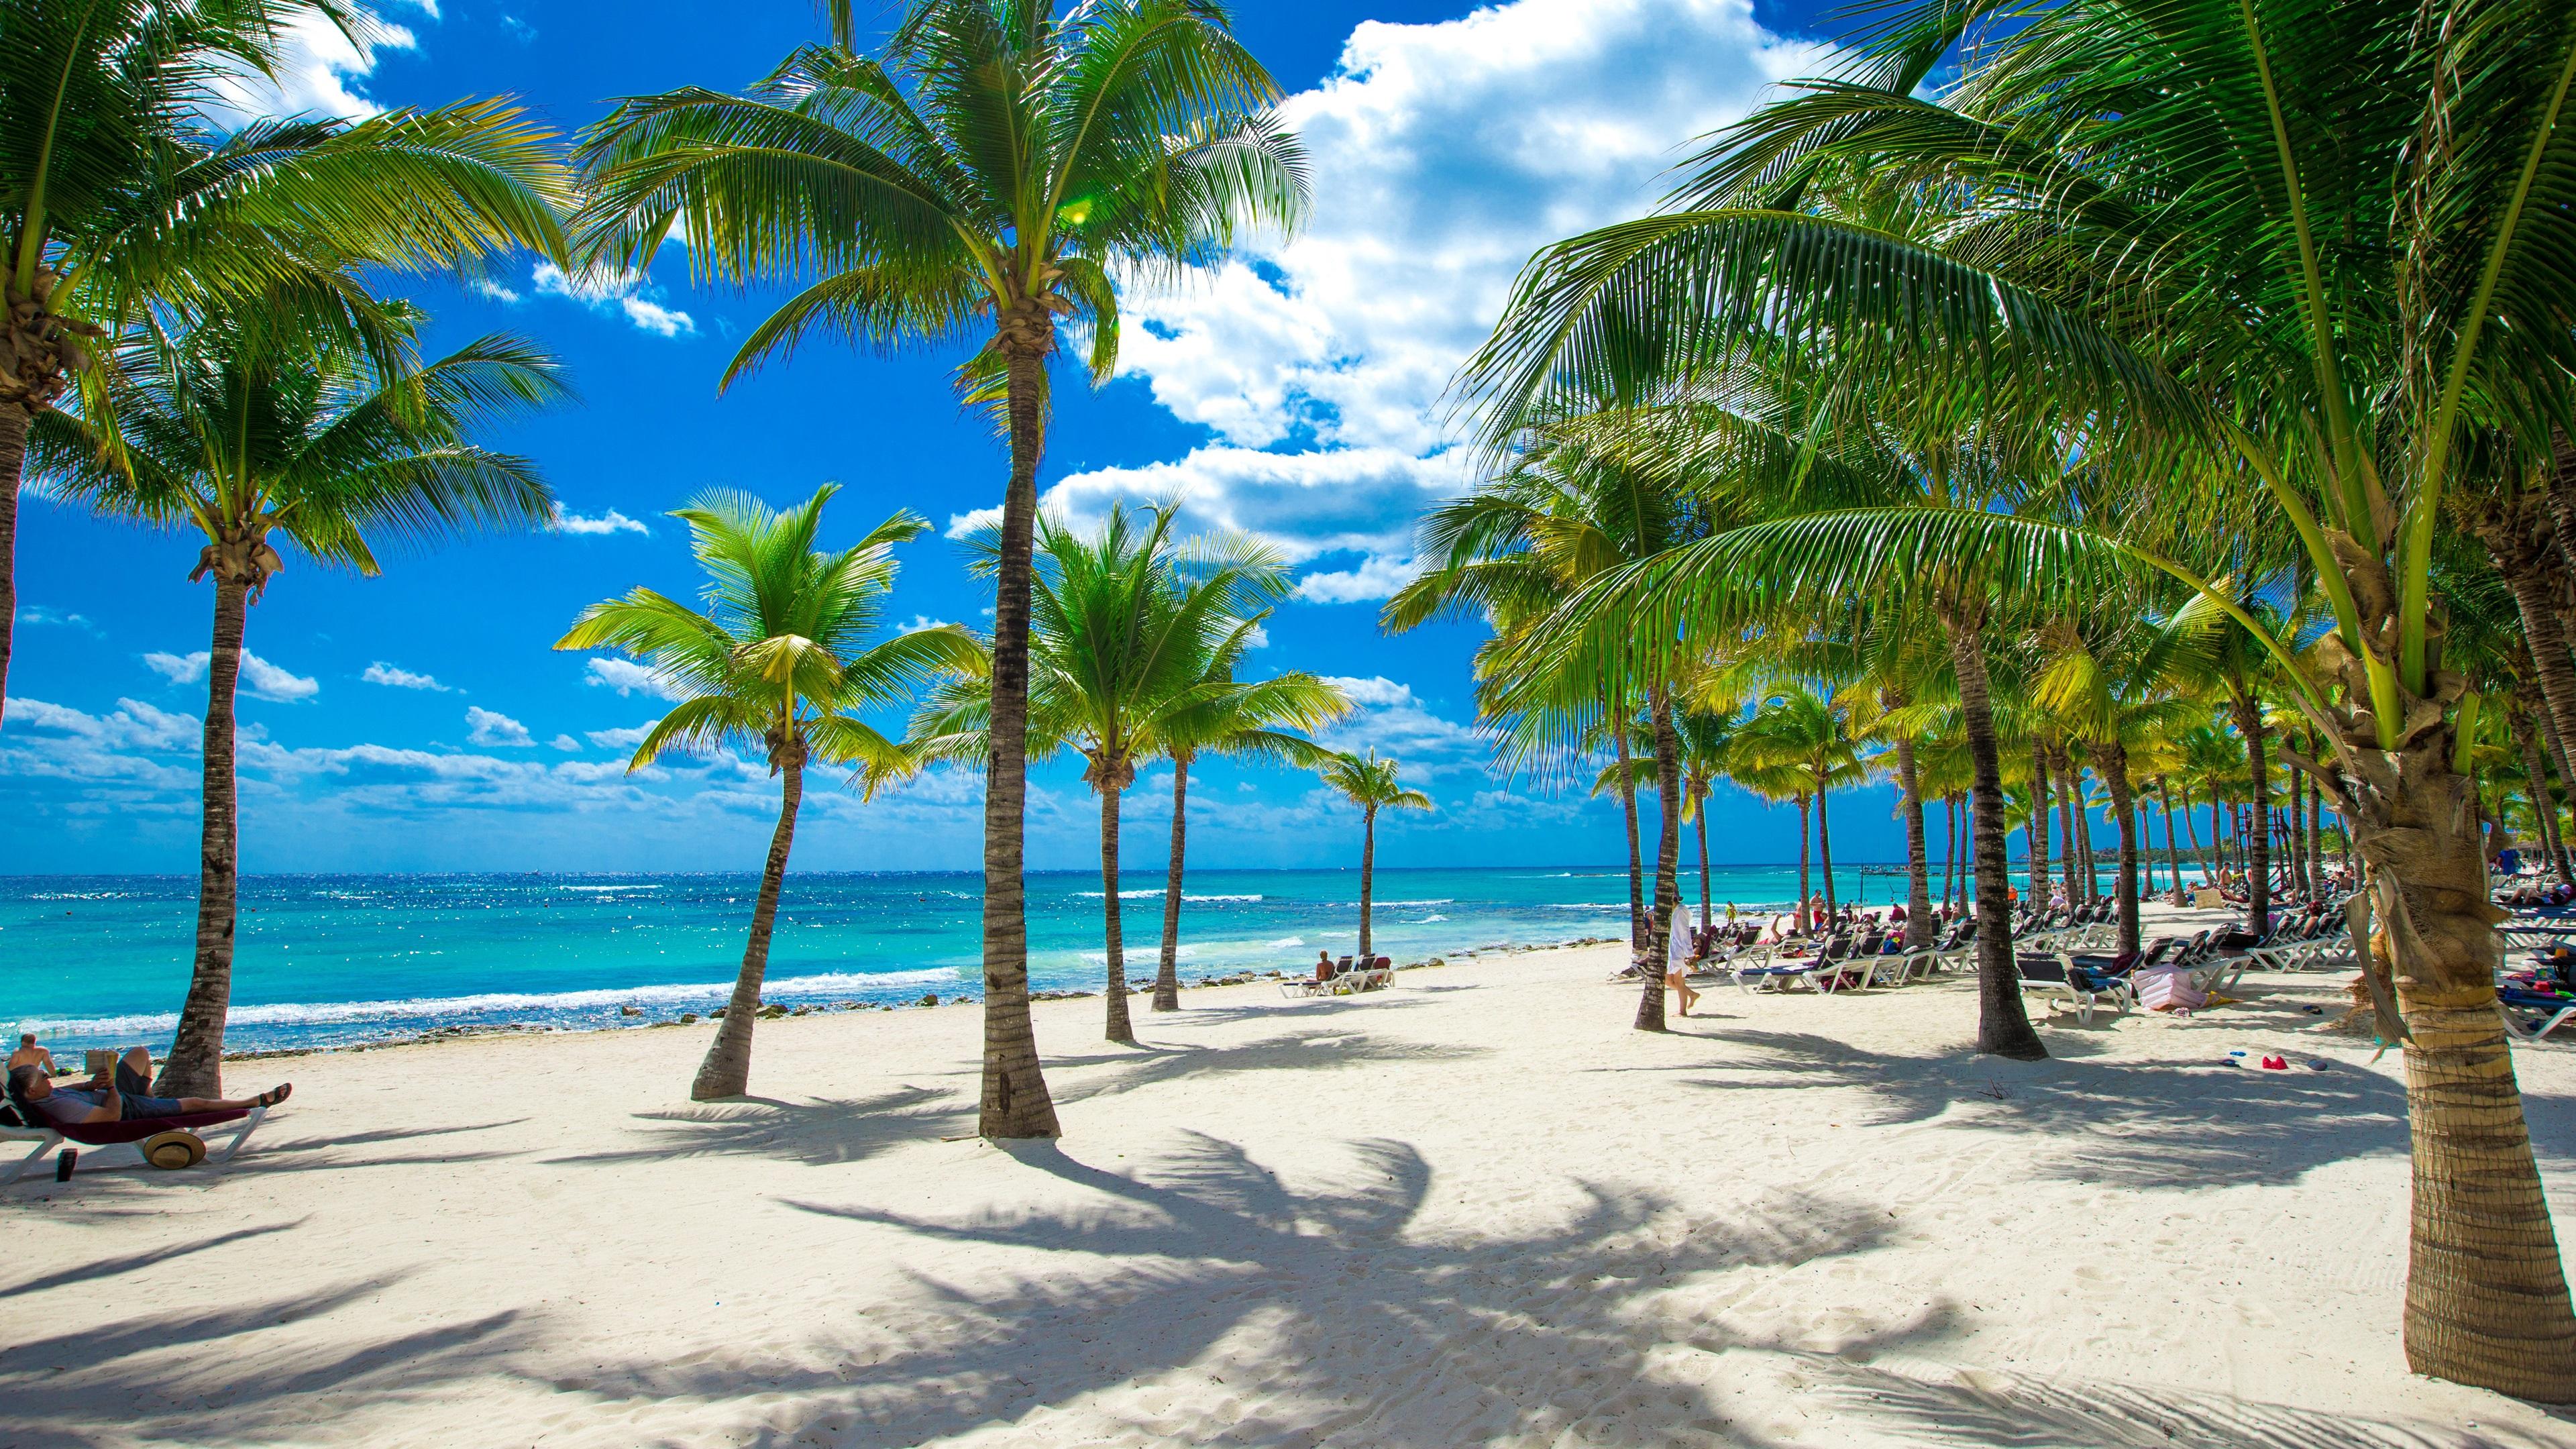 Fondos de pantalla playa mar palmeras tropical nubes sol 3840x2160 uhd 4k imagen - Playa wallpaper ...